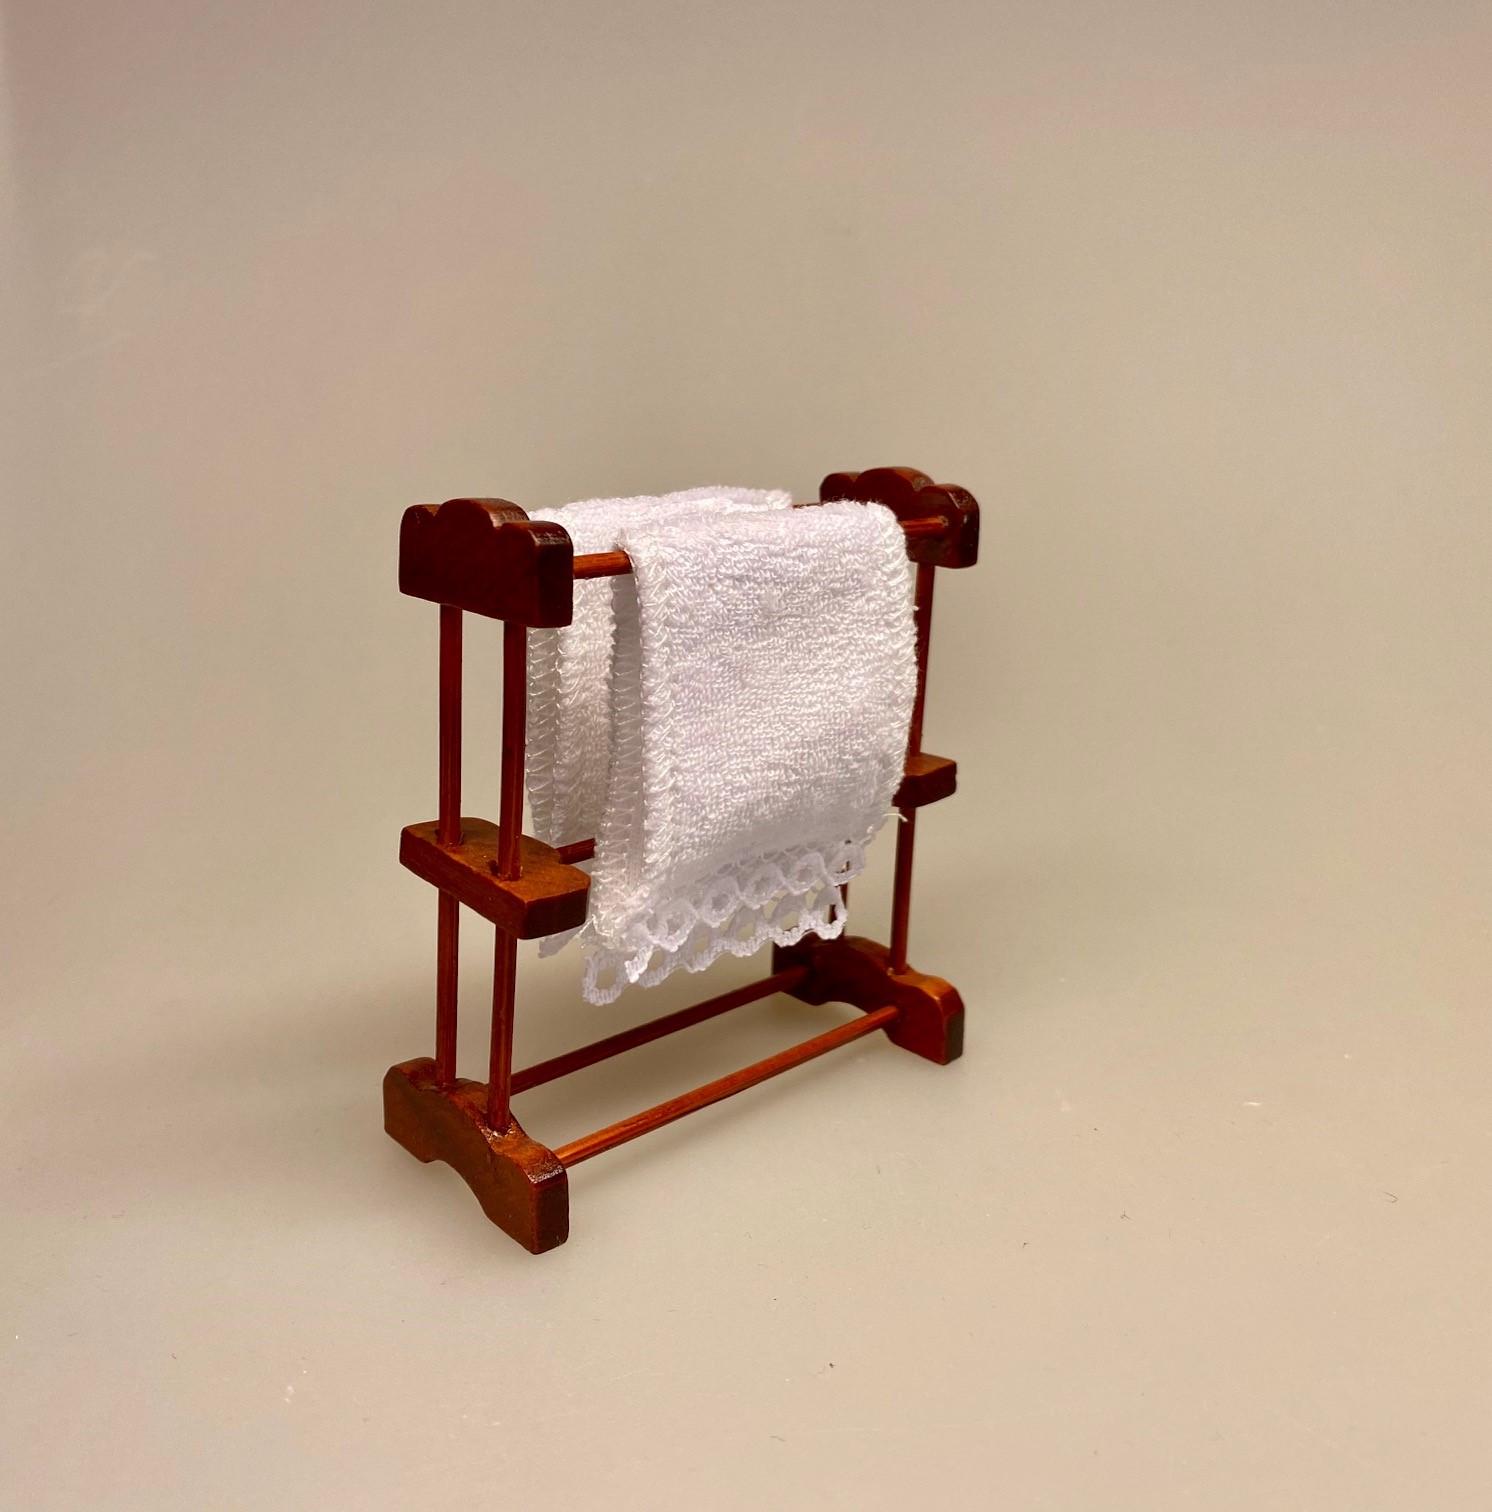 Miniature Håndklædestativ med 2 Håndklæder, håndklædeholder, badeværelse, dukkehusting, dukkehus, dukkehuse, dukkehuset, dukkehustilbehør, ting til dukkehus, miniaturer, miniaturemøbler, dukkehusmøbler, skala 1:12, 1:12, biti, ribe, dukketing,